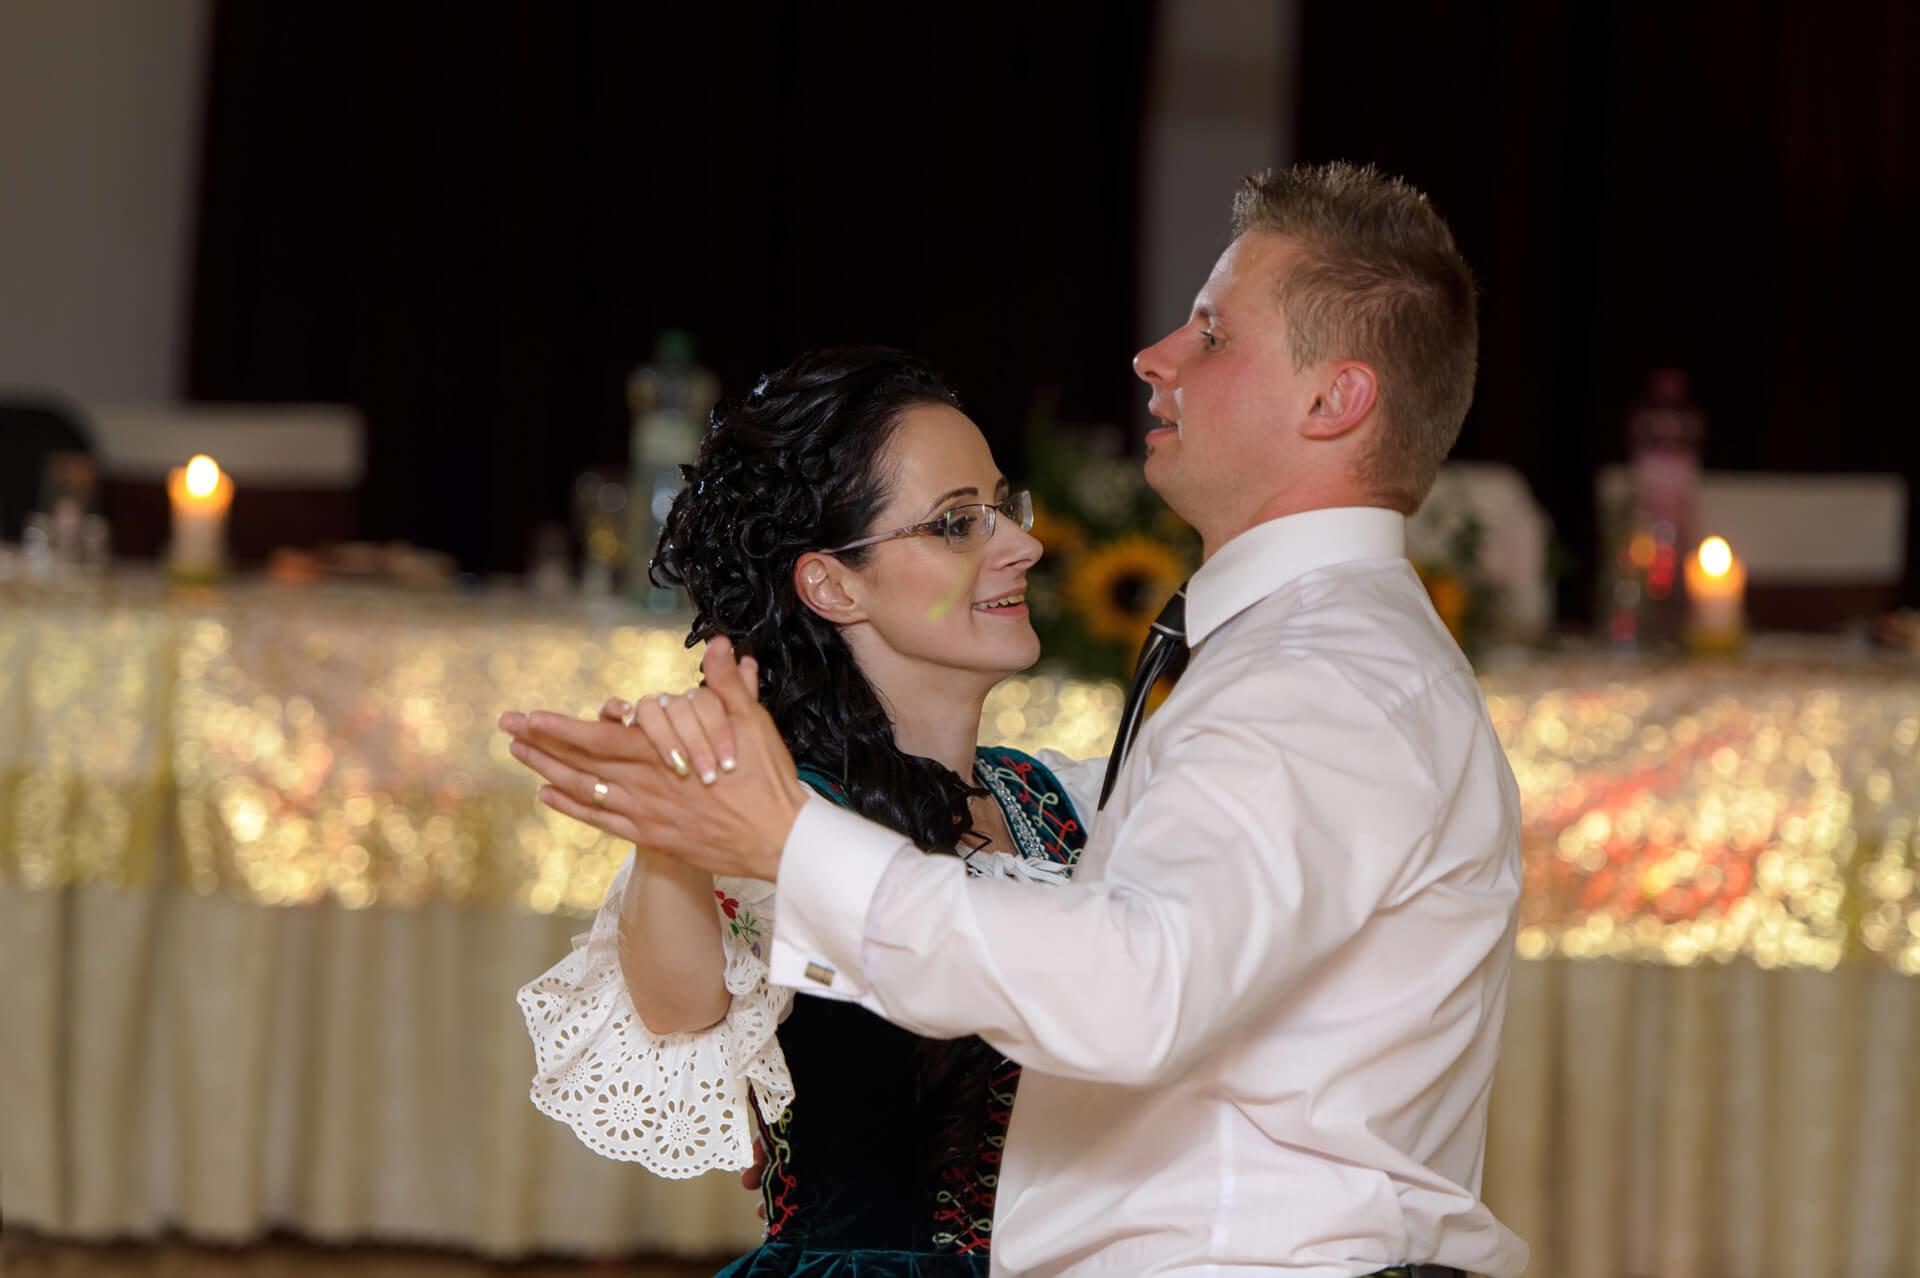 svadba svadobny zabava prvomanzelsky tanec hostina profesionalne fotenie fotograf Peter Norulak Kosice__03